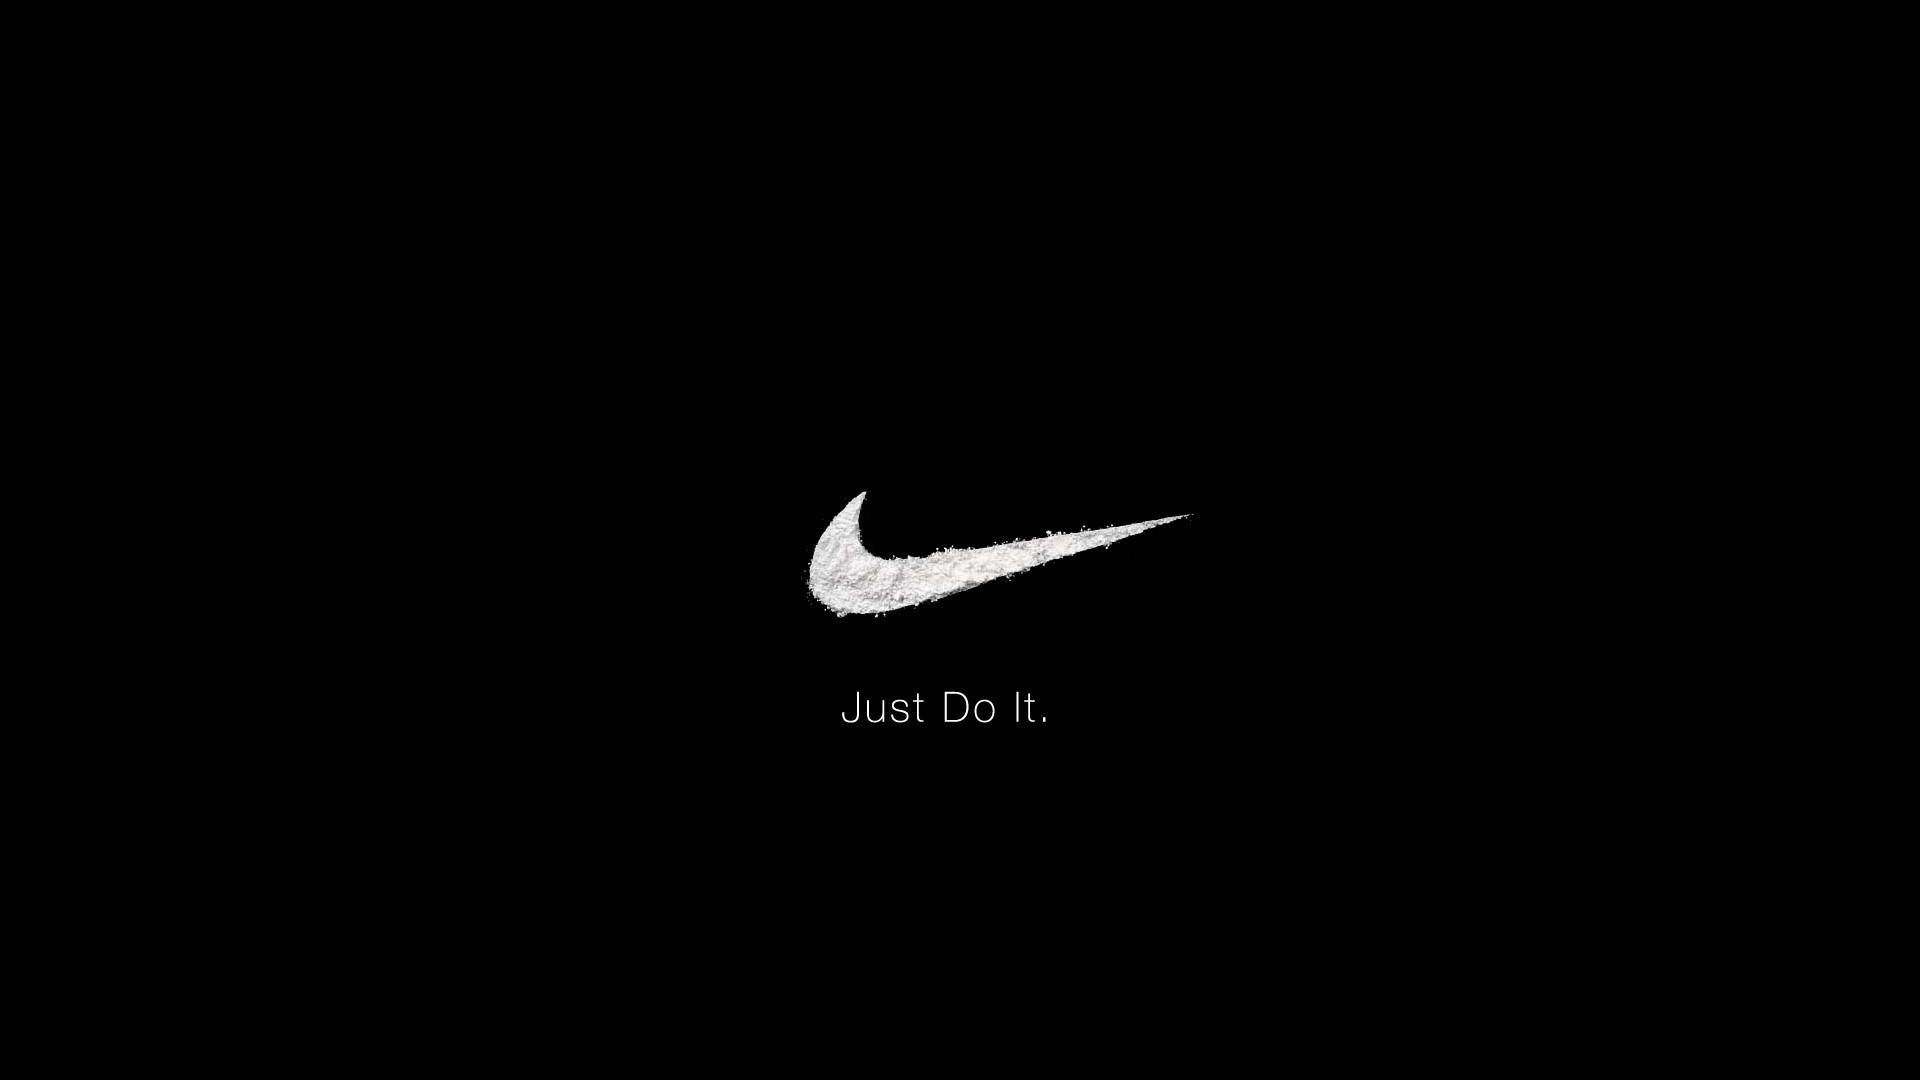 … Green Flame Wallpaper. Inspirational Nike Just Do It Wallpaper